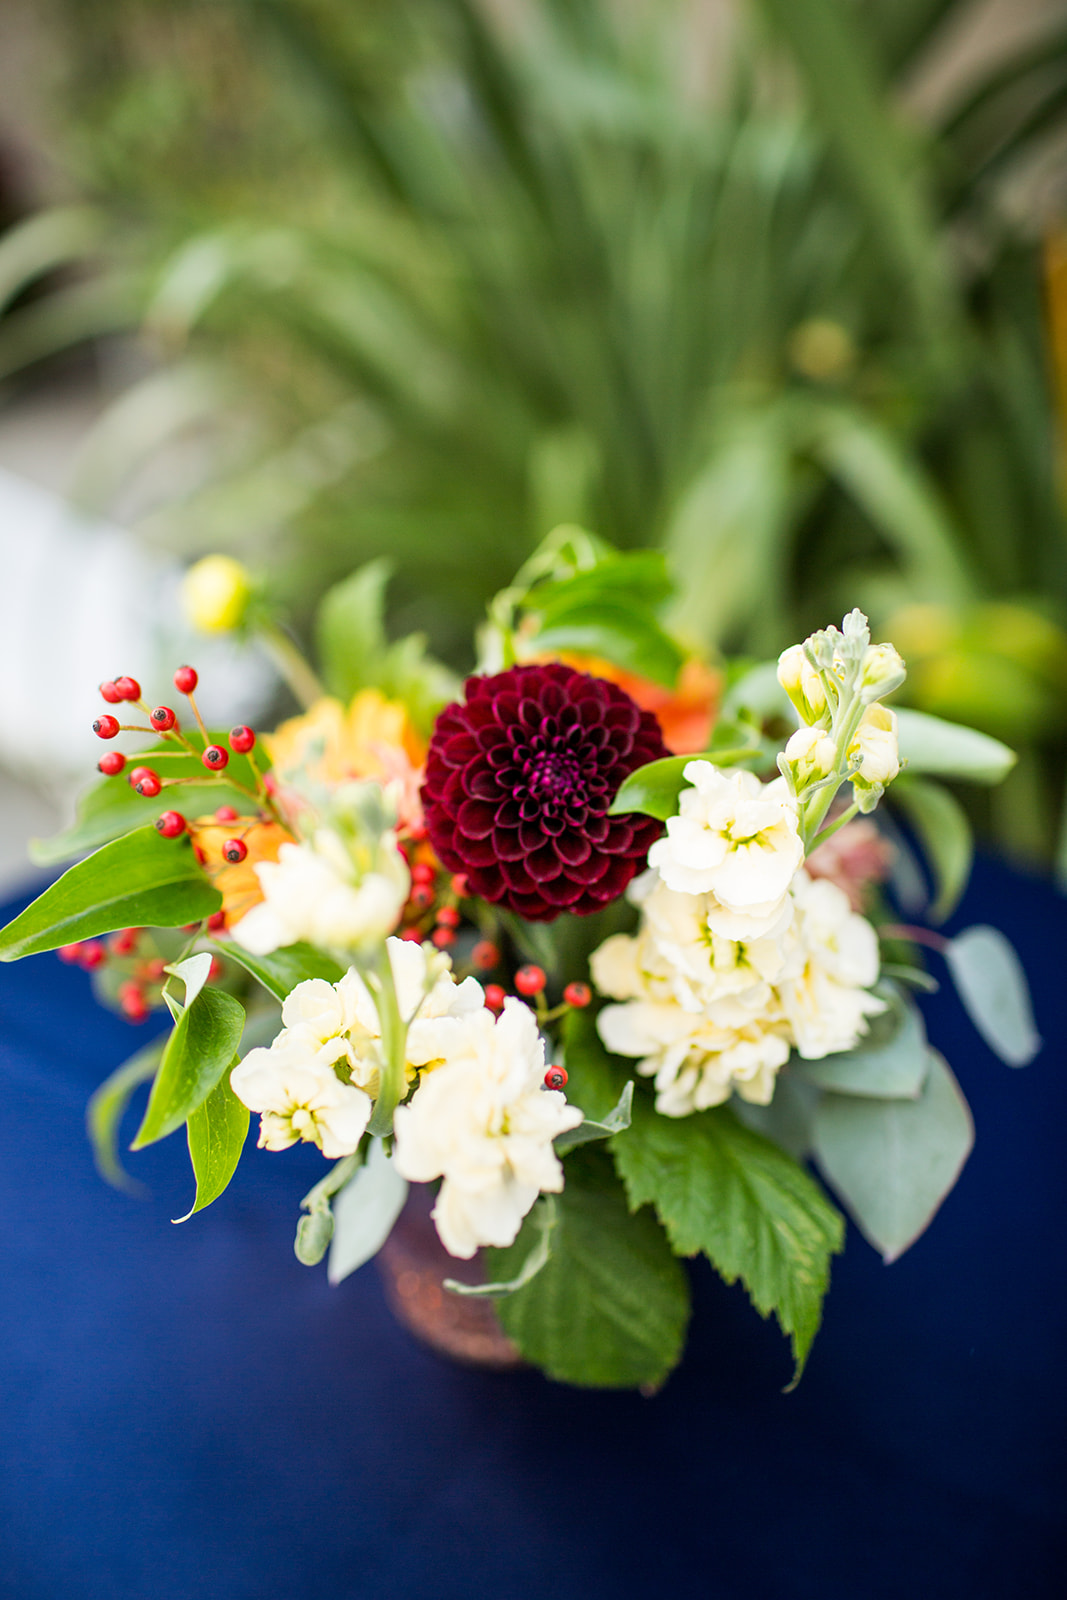 Low flower arrangement with dahlias and stock resting on blue velvet linen